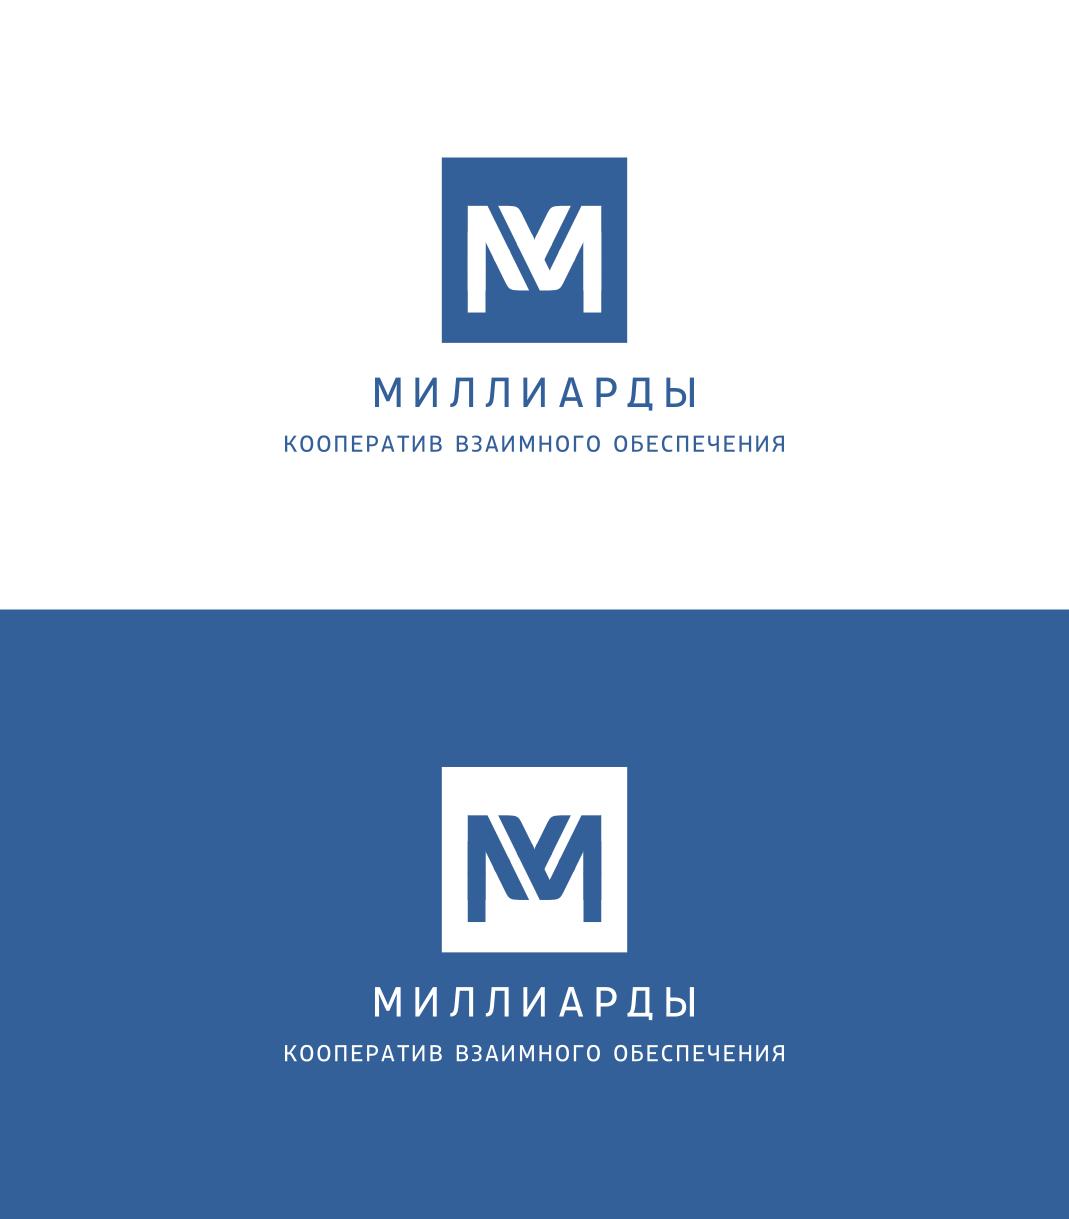 Создание логотипа фото f_1415e419680d0002.png